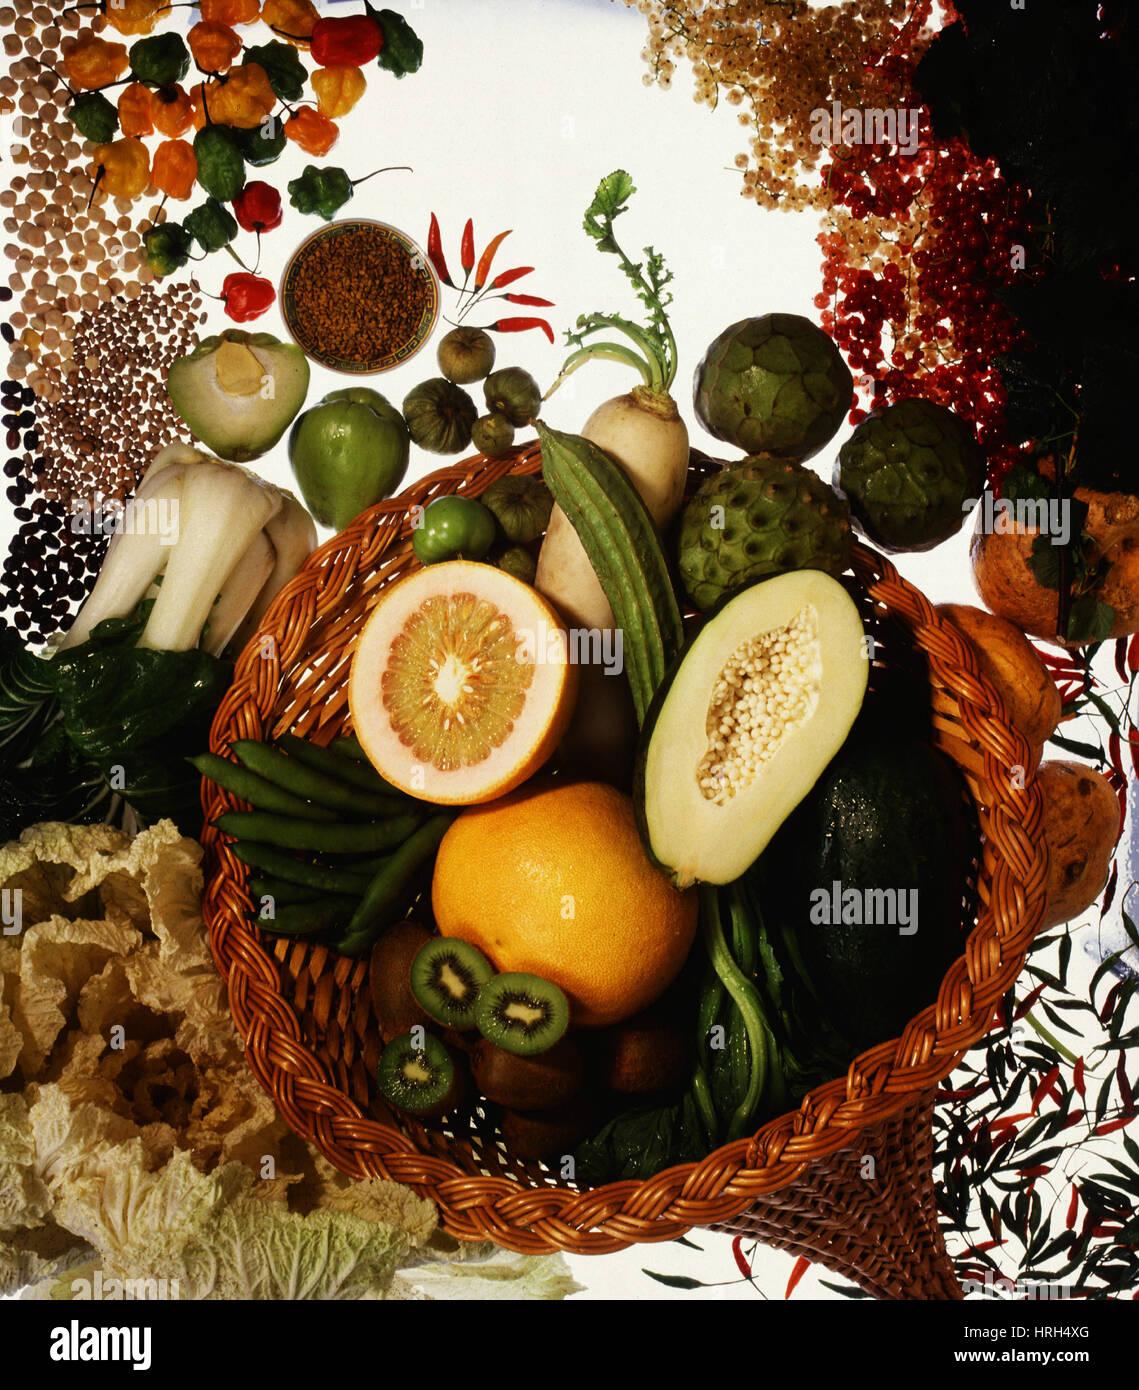 Cornucopia of exotic fruit and vegetables - Stock Image